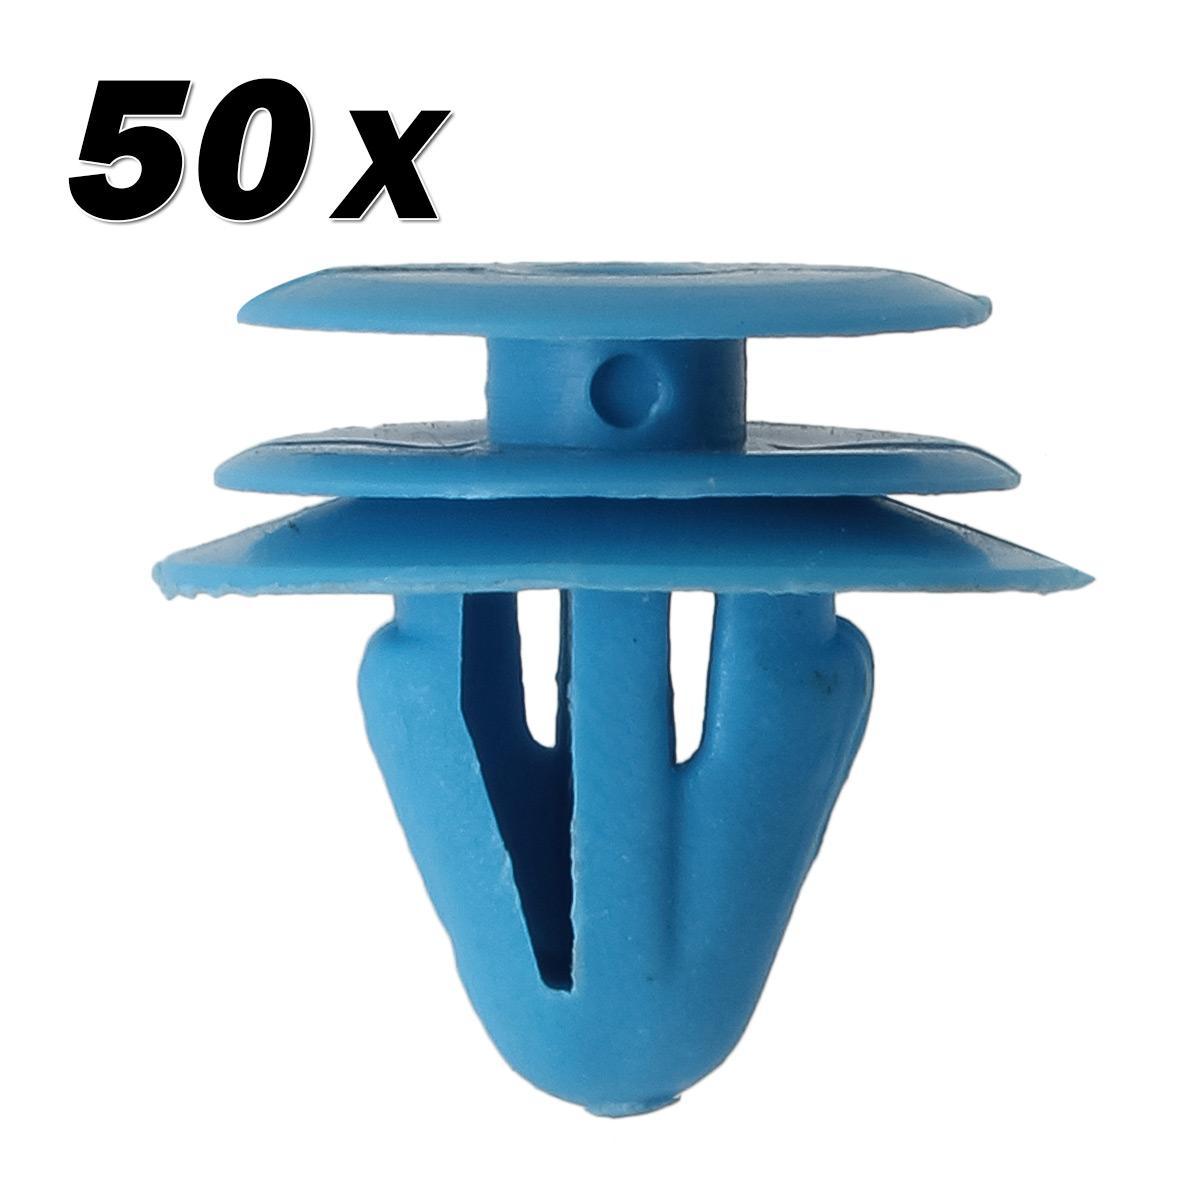 20pcs Nylon Door Trim Panel Moulding Tail Gate Clip for Kia Optima Forte Amanti